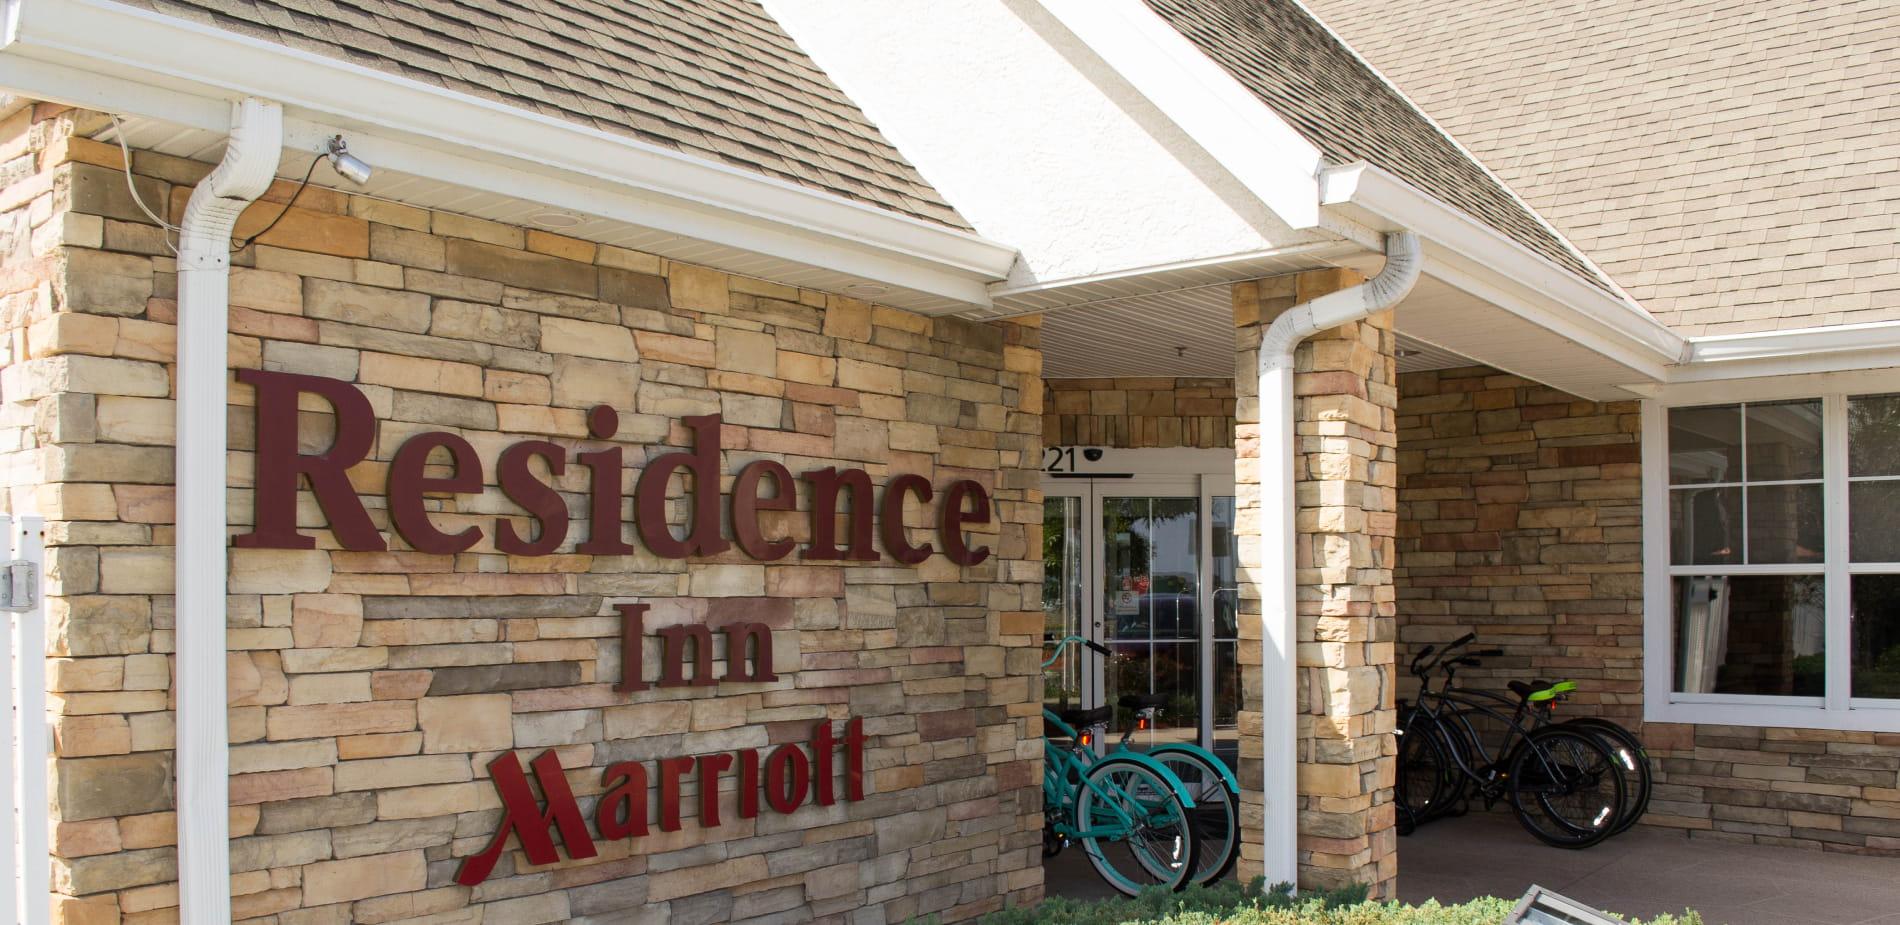 Residence Inn Marriot Hospitality Build